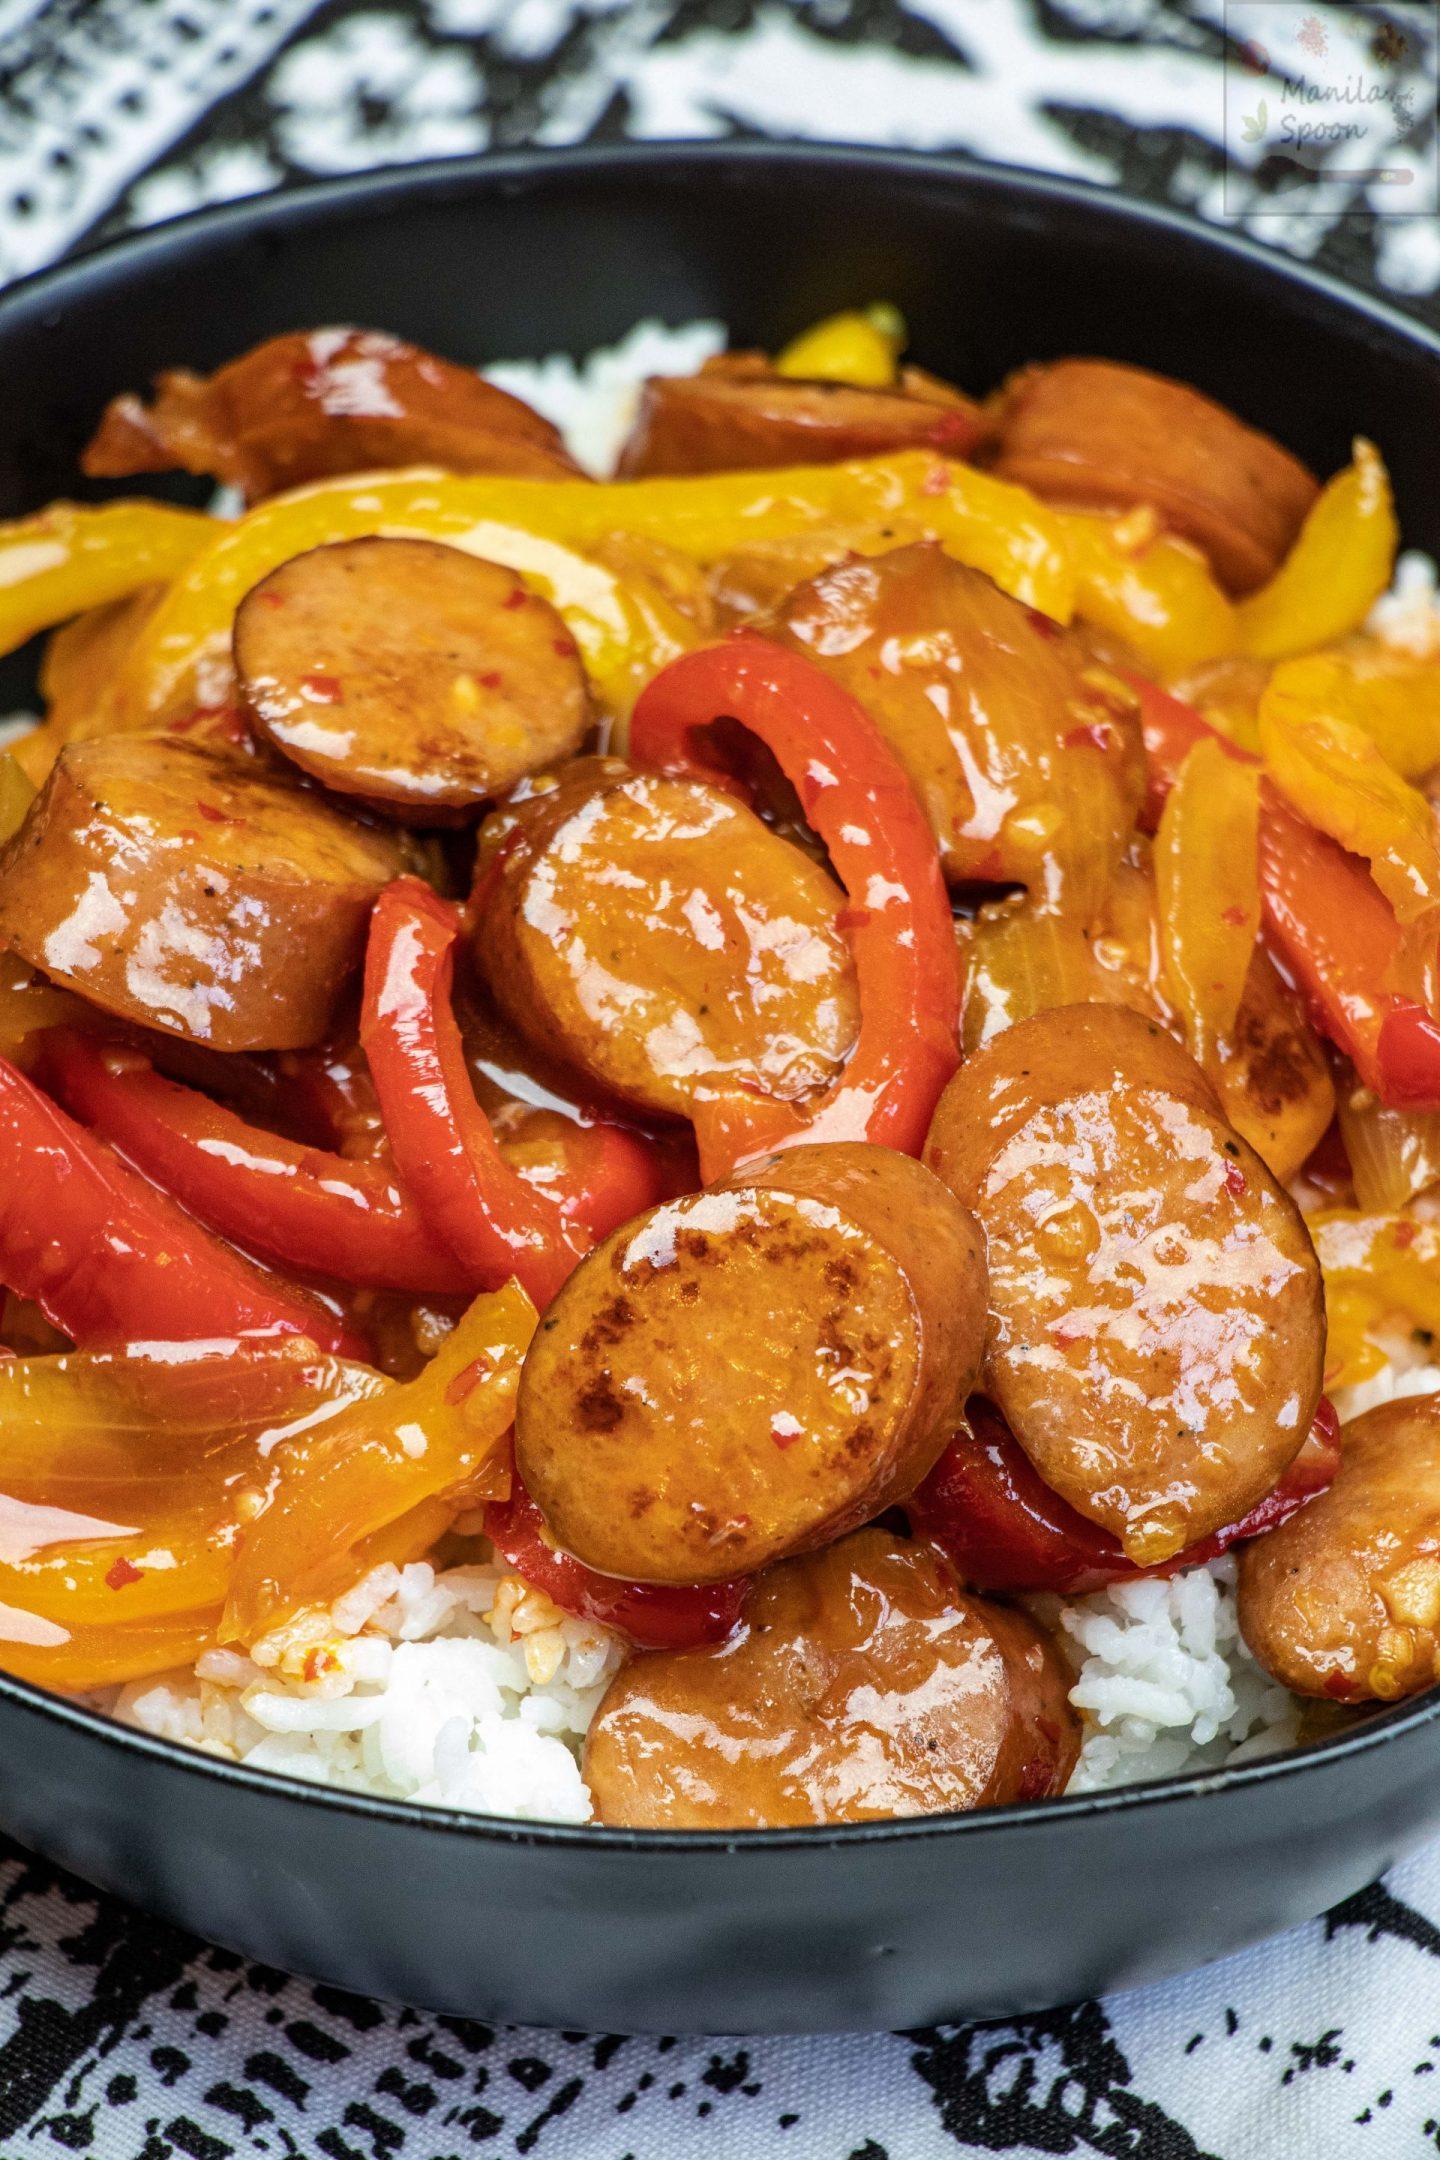 Easy Kielbasa Stir-Fry Recipe